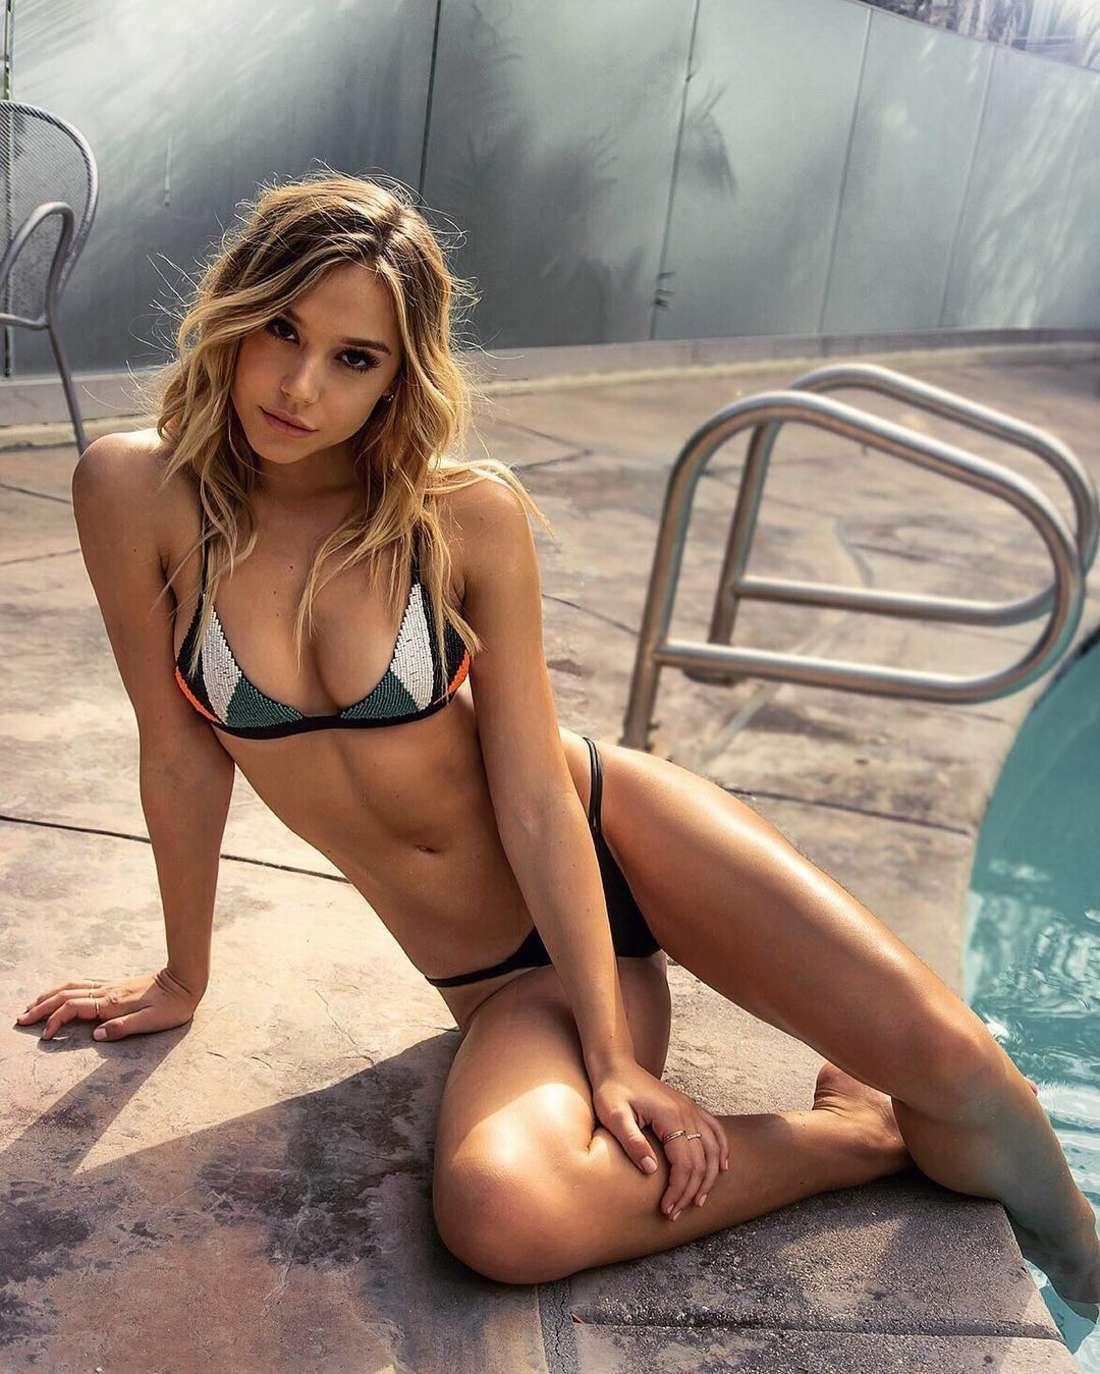 alexis-ren-sexy-3 | alexis ren | pinterest | alexis ren, swimming